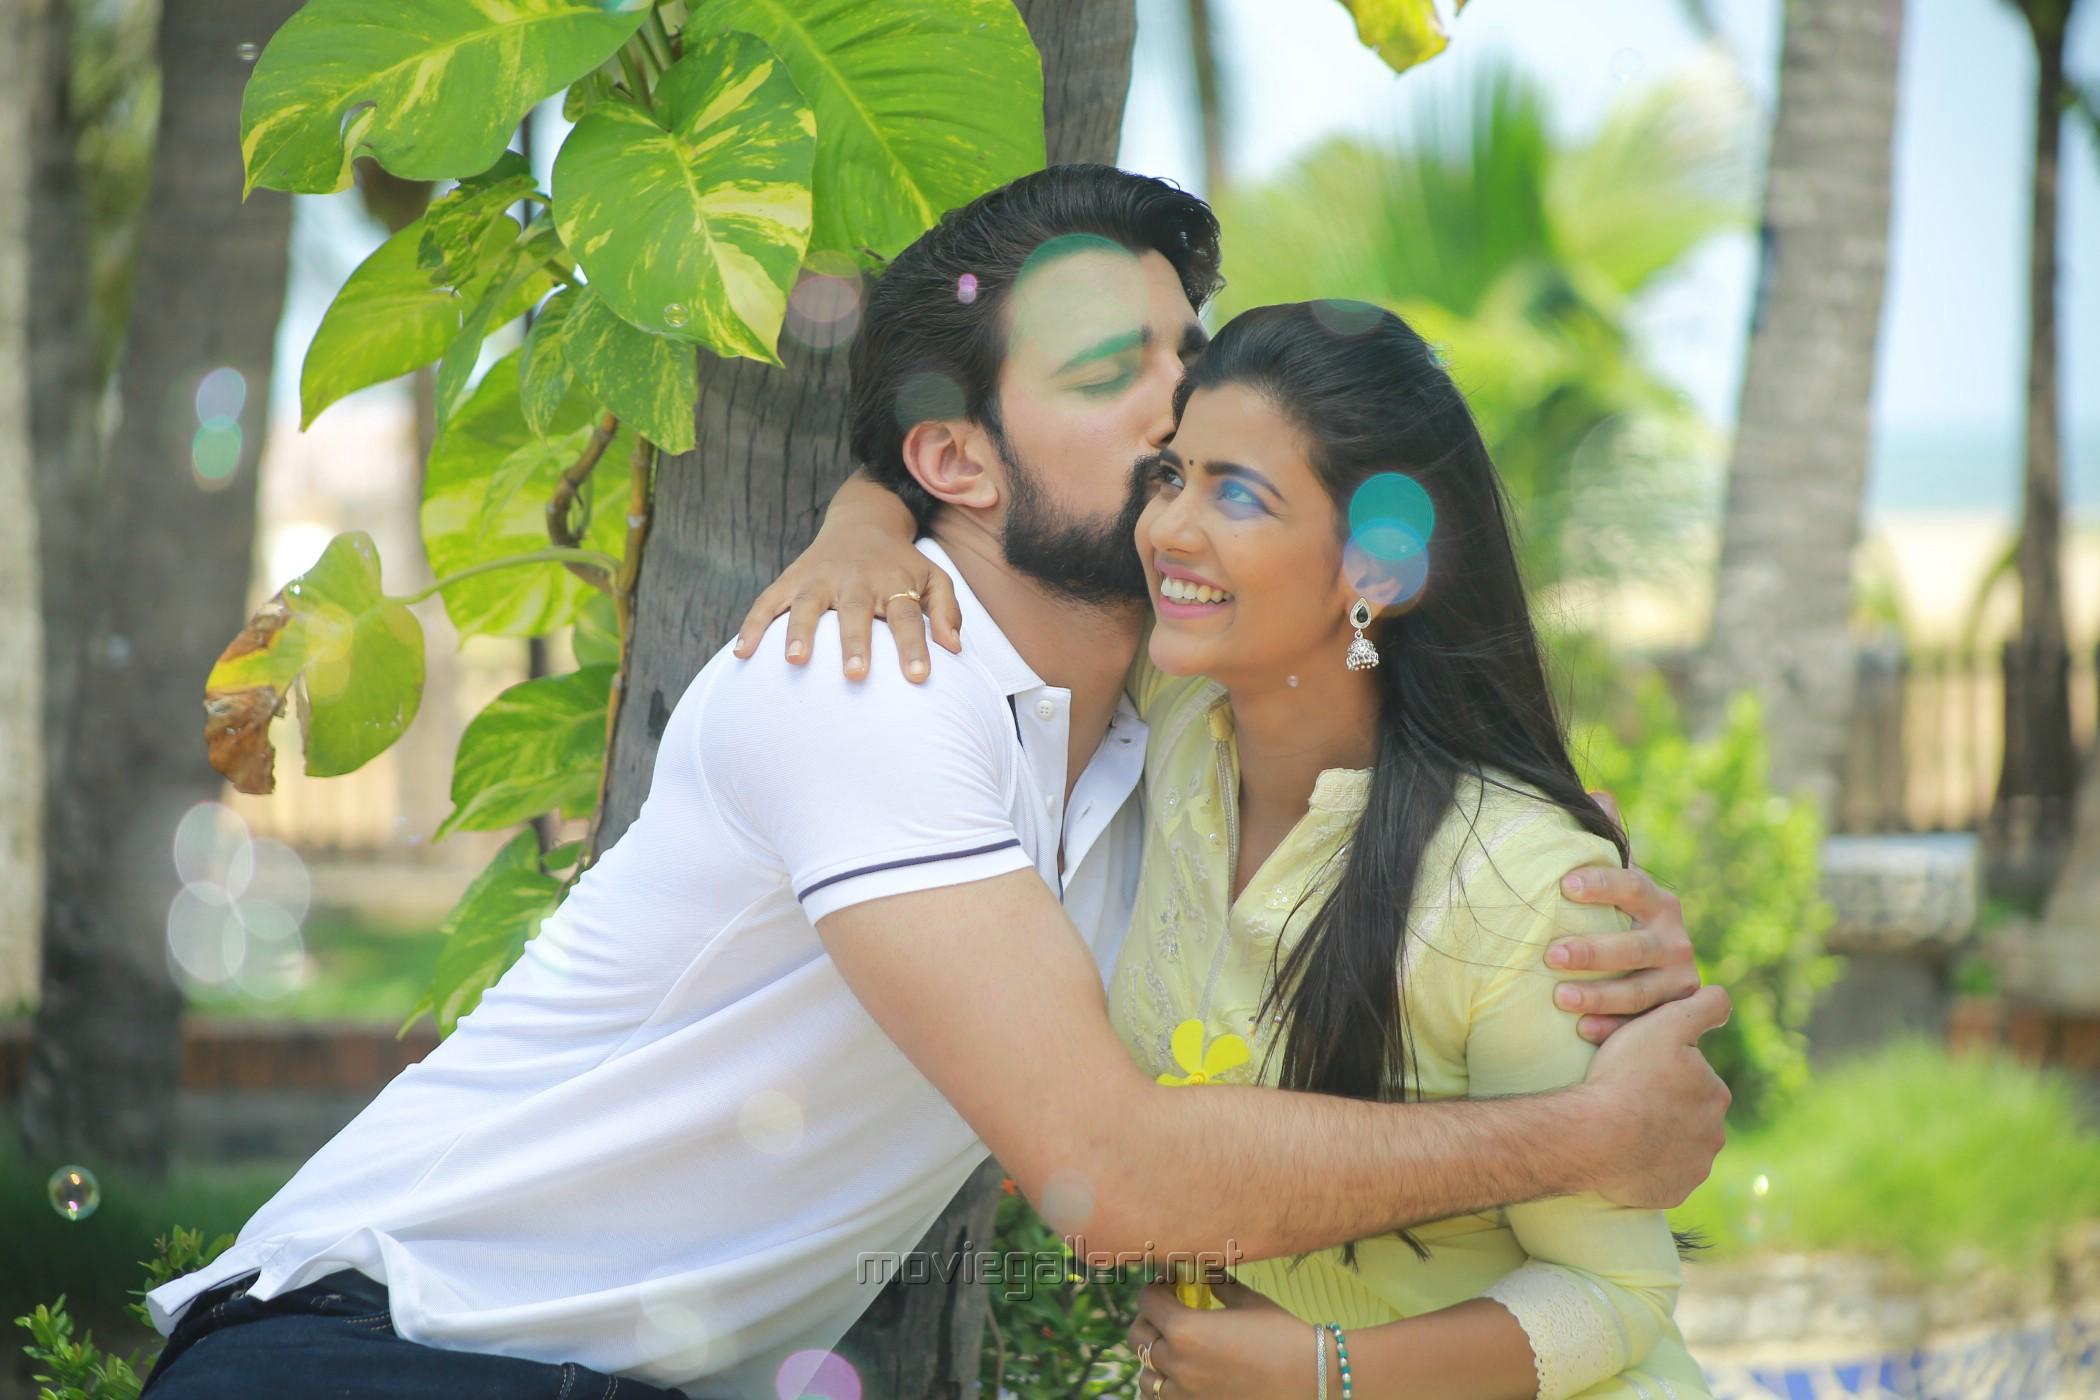 Nicky Sundaram, Aishwarya Rajesh in Mei Movie Stills HD